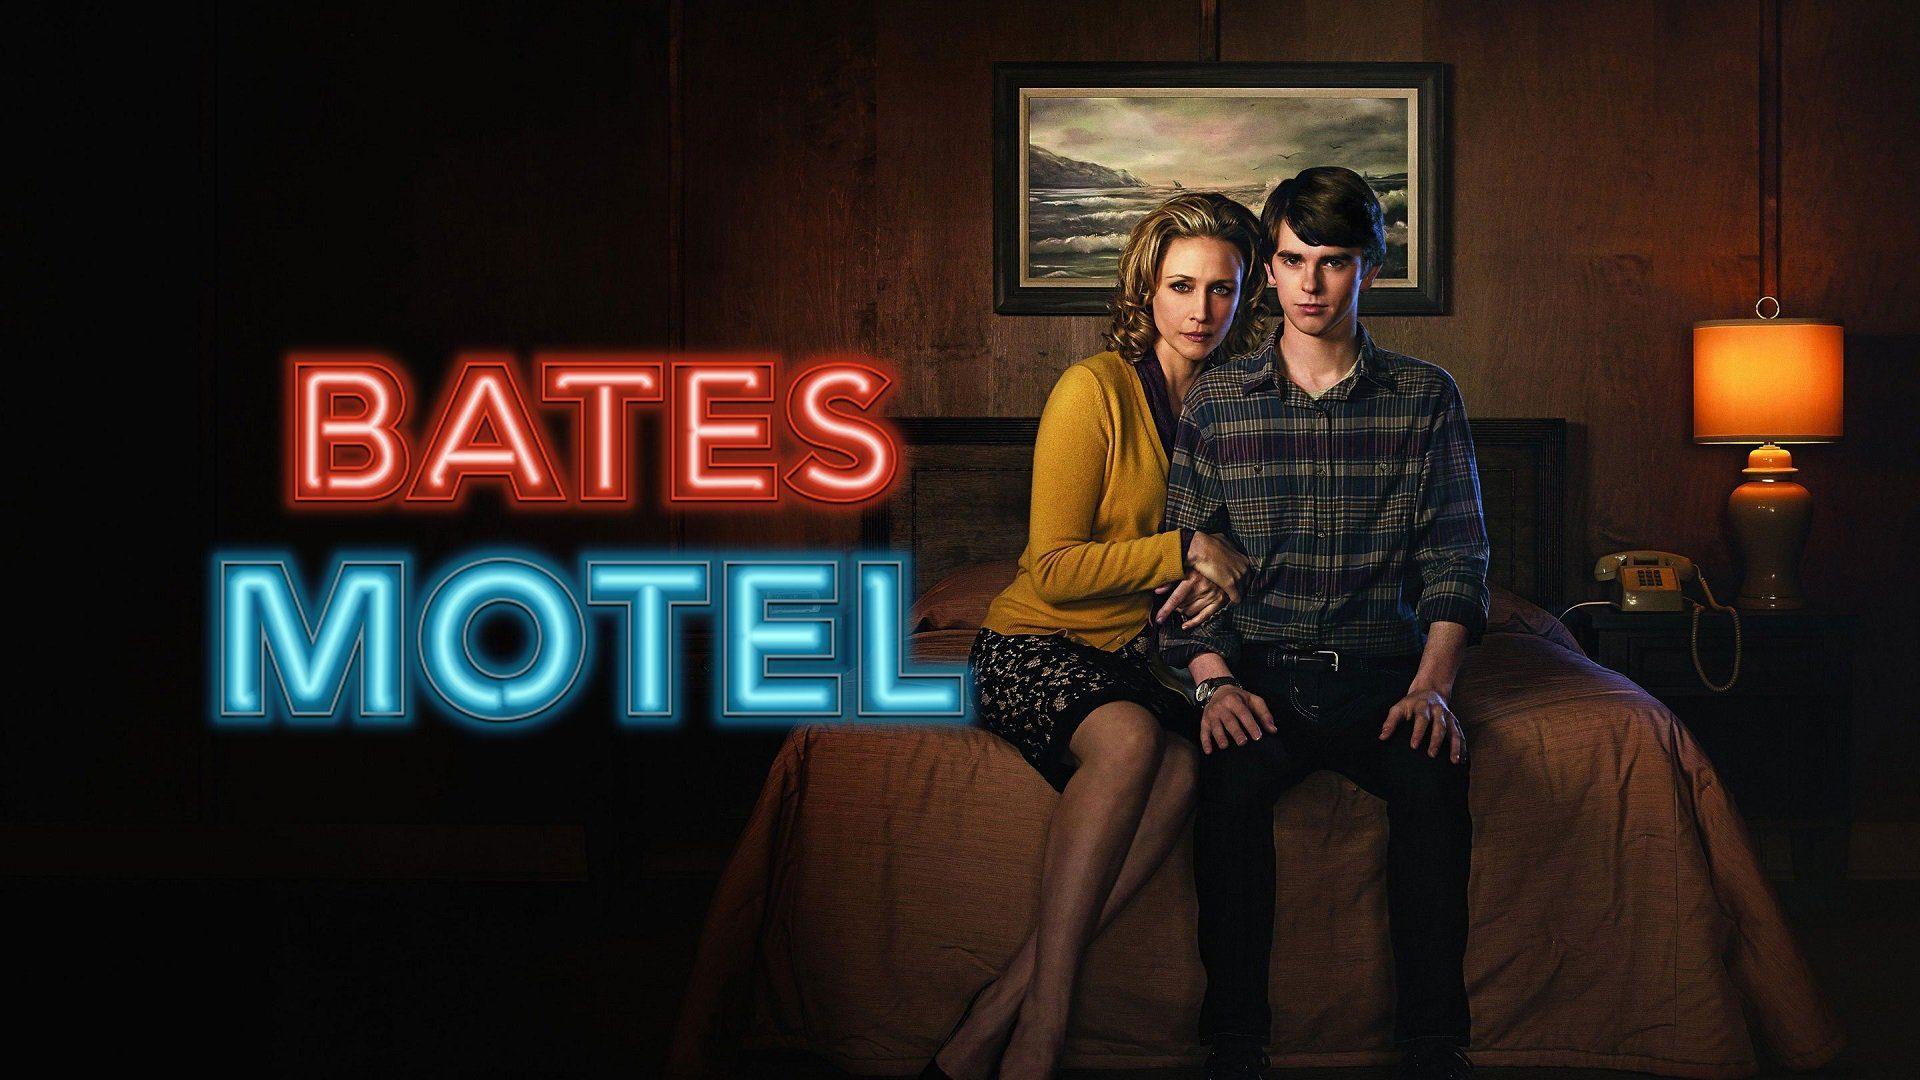 serie tv_quarantena_bates motel_ninja marketing